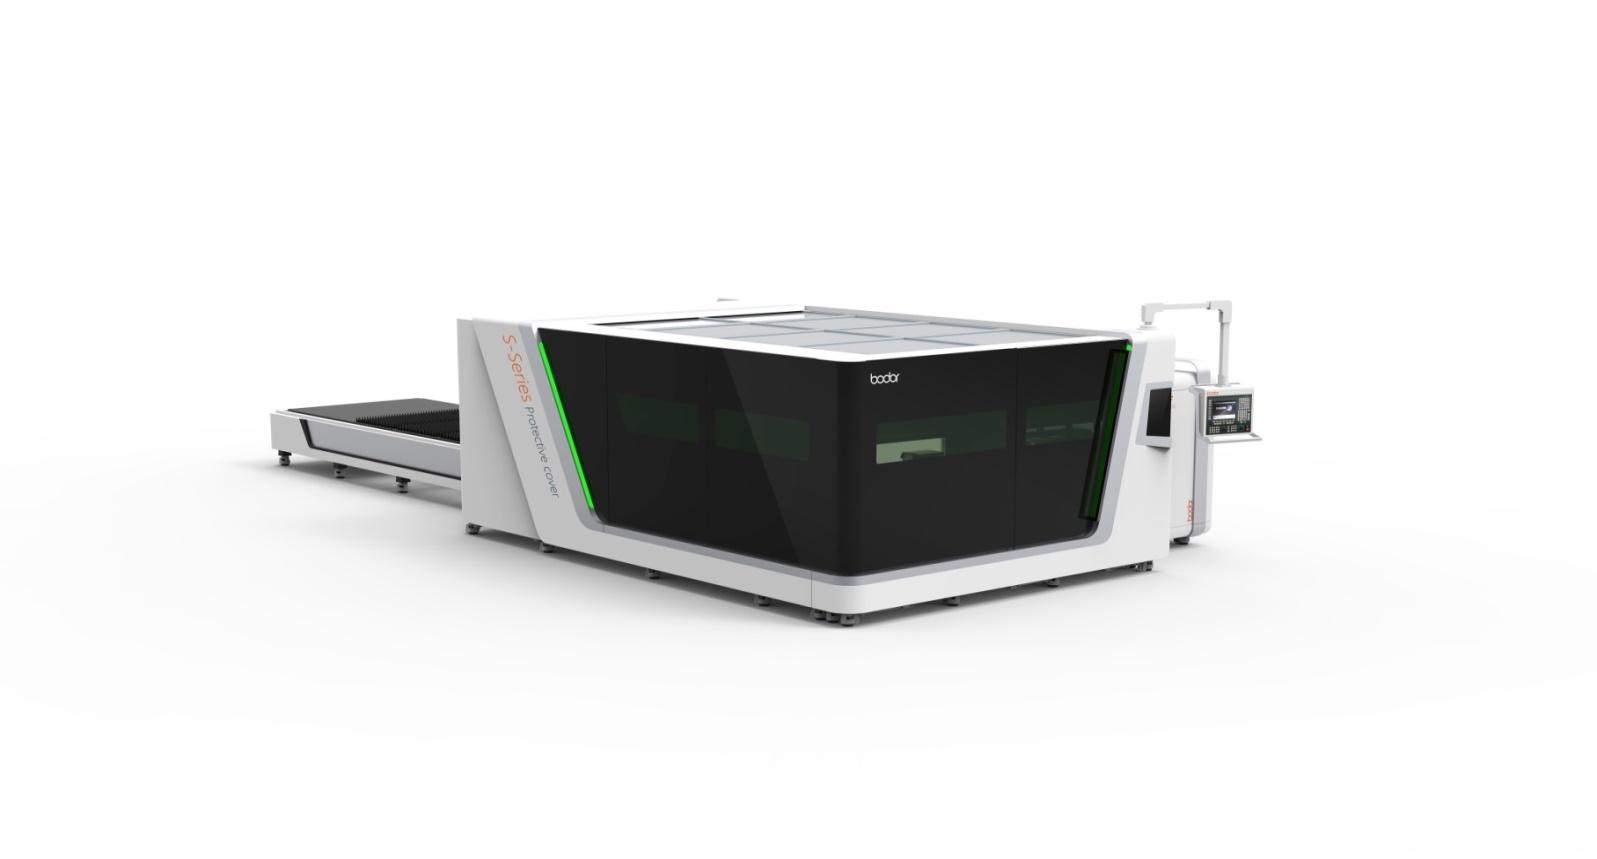 Wycinarka-laserowa-BODOR-seria-S.